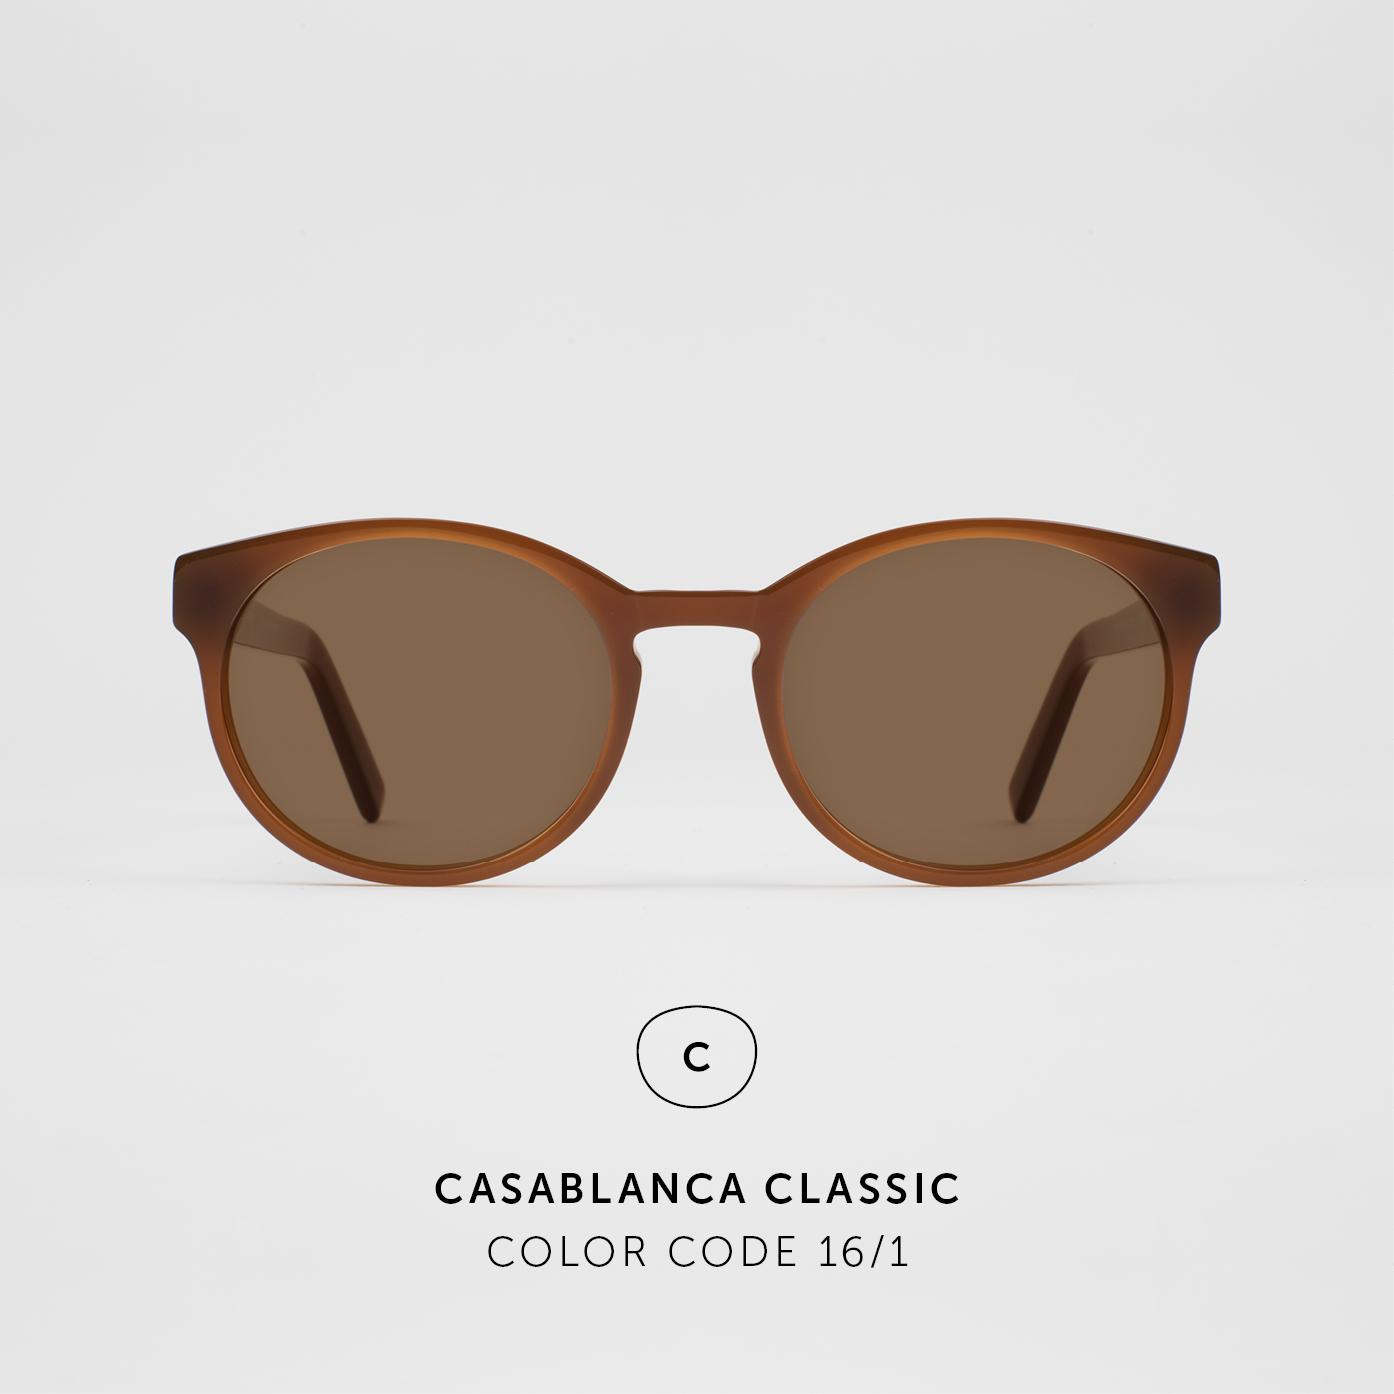 CasablancaClassic42.jpg